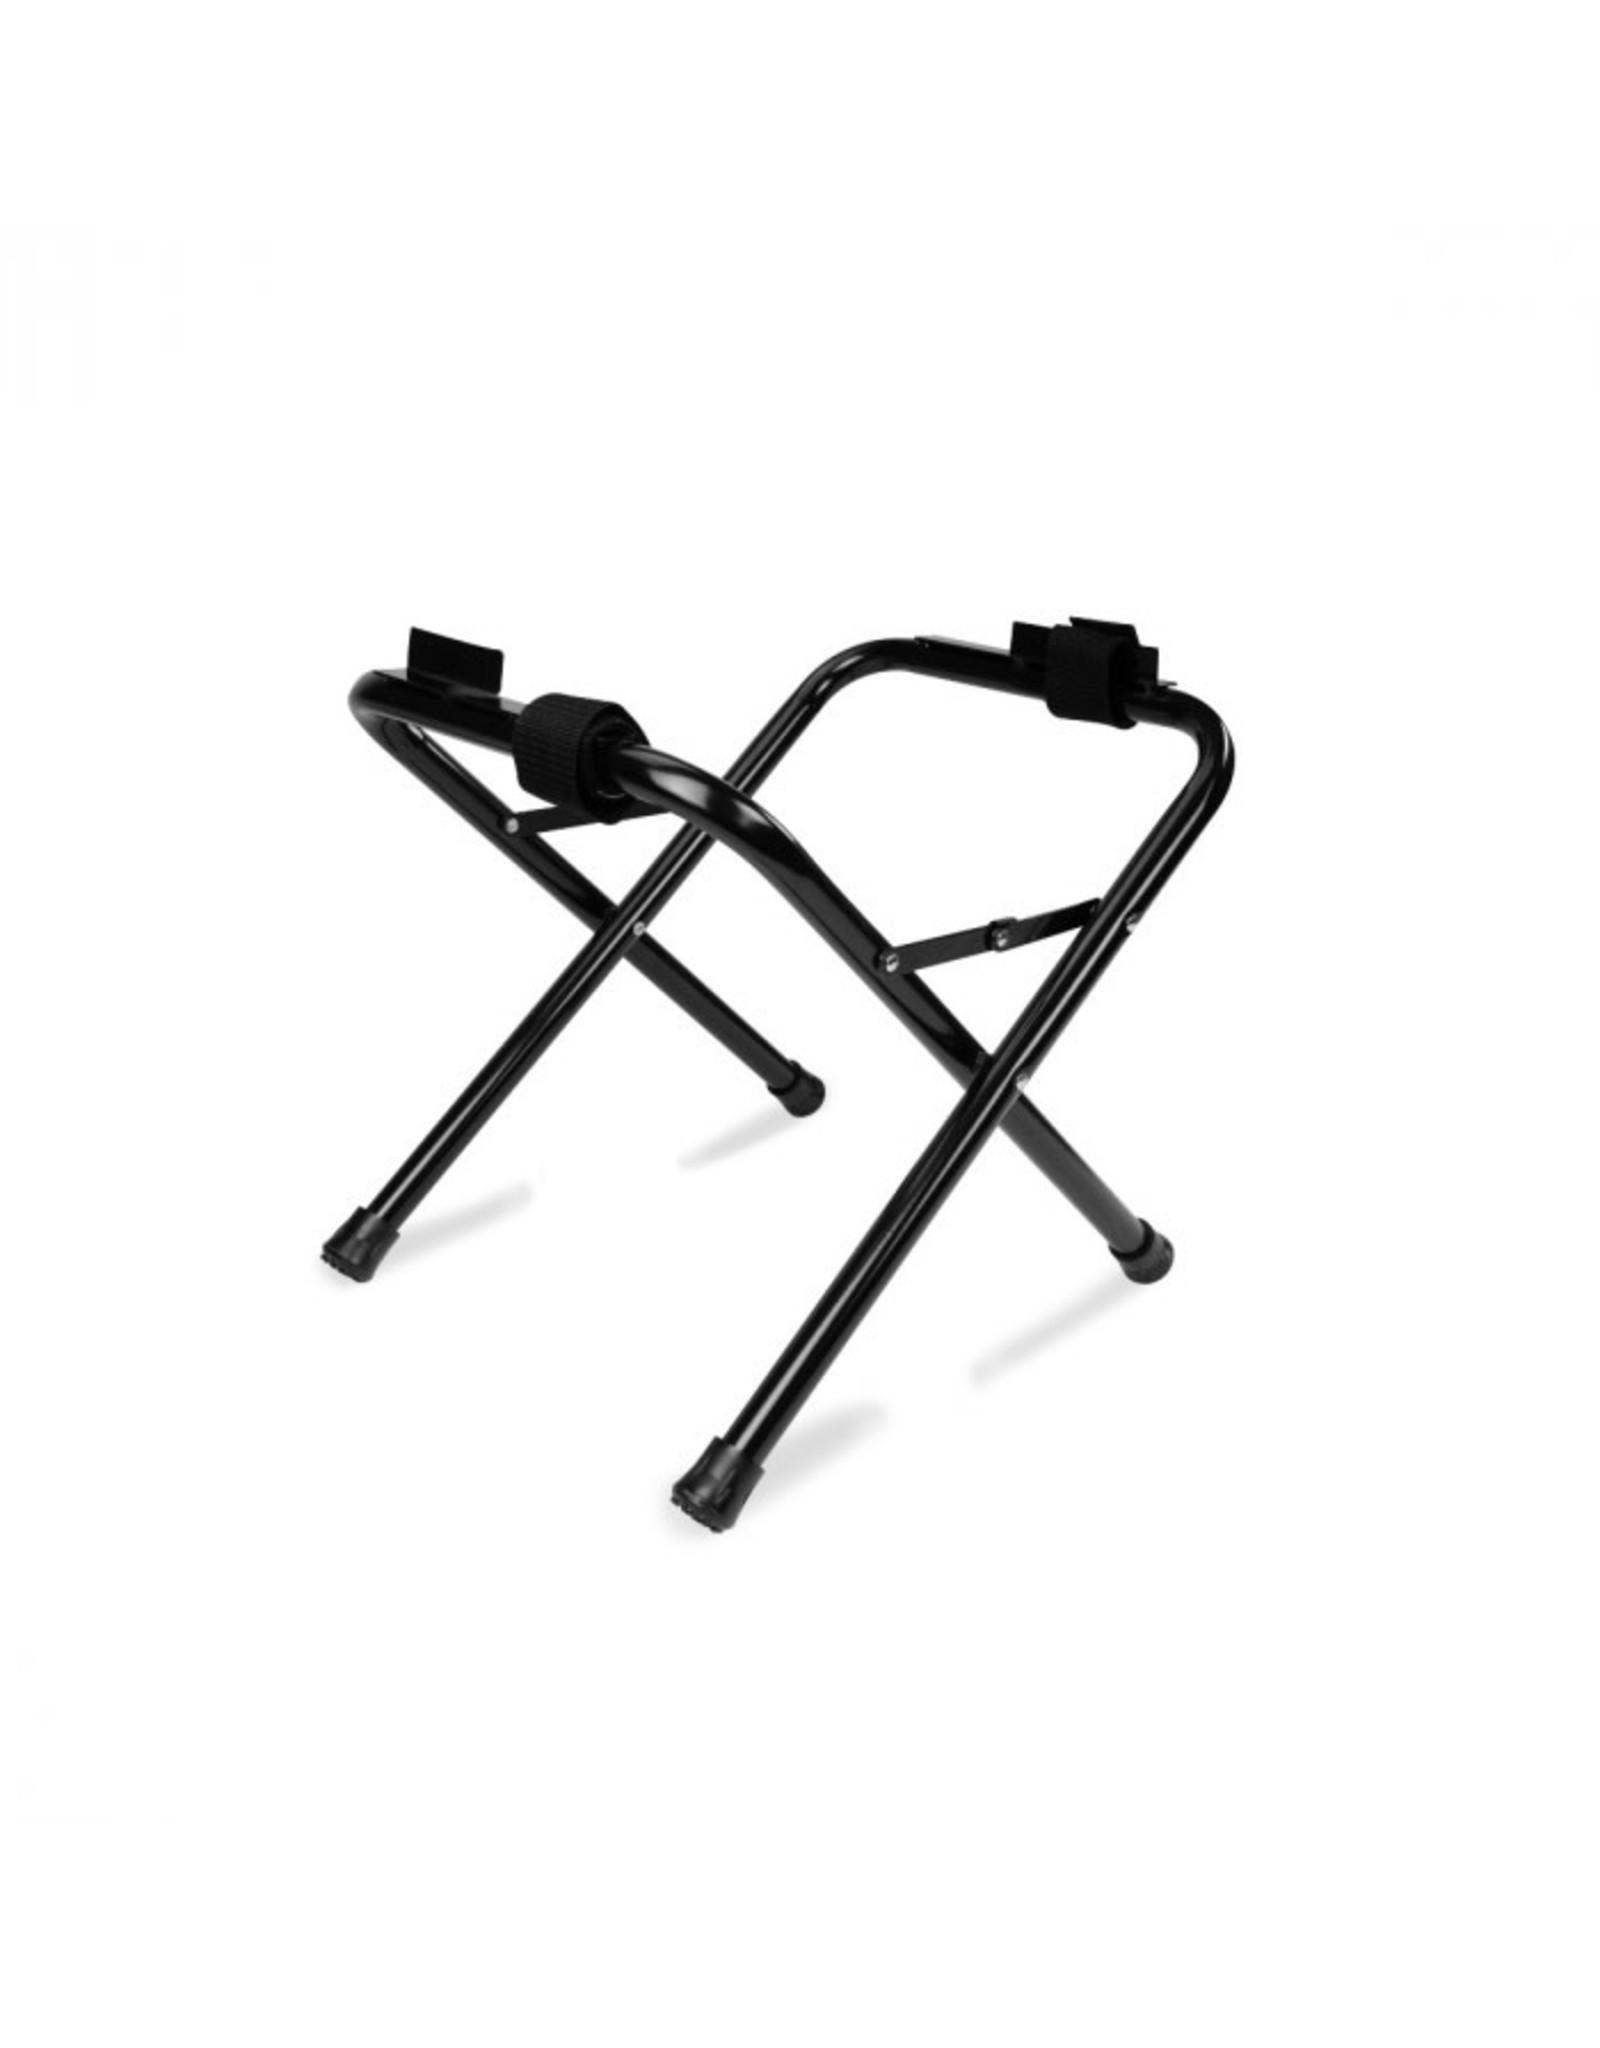 Stadium Chair Company STADIUM CHAIR LEGS